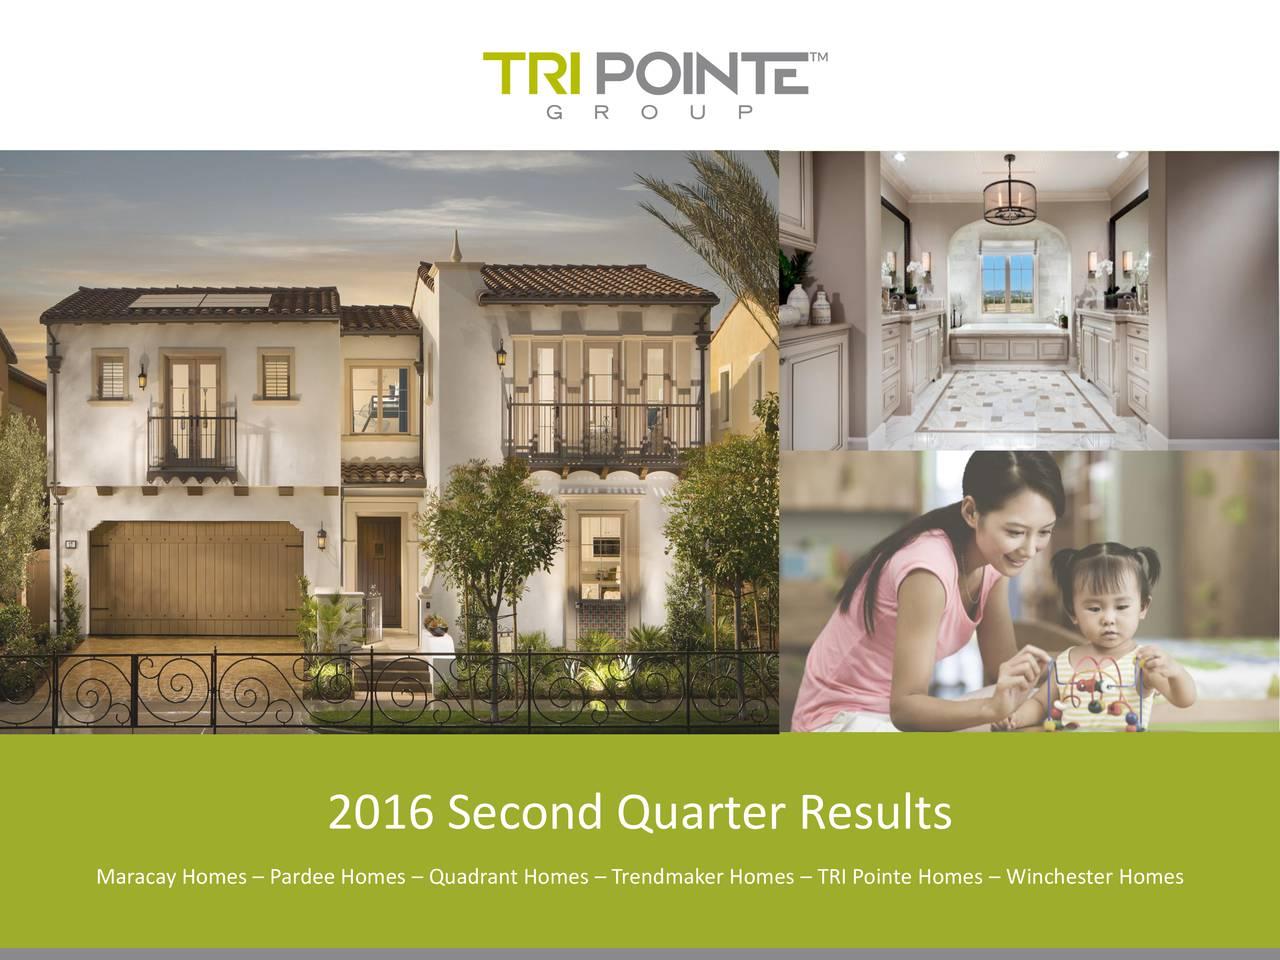 Maracay Homes  Pardee Homes  Quadrant Homes  Trendmaker Homes  TRI Pointe Homes  Winchester Homes